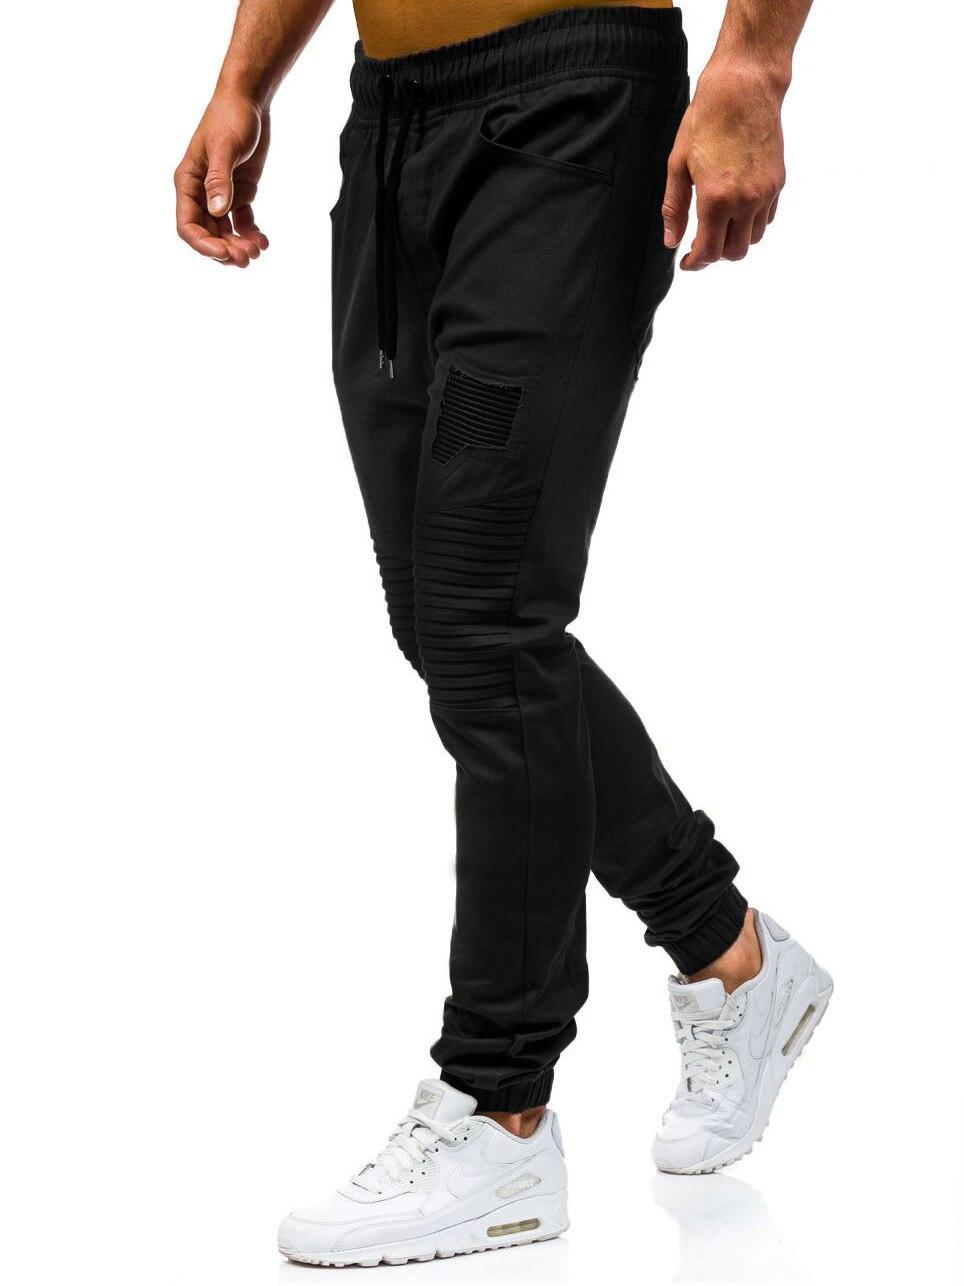 Men Sweatpants Casual Pants Slim fit Drawstring Sweatpants Slacks Elastic Waist Patchwork Pleated Ultrathin Male Trousers Jogger 14